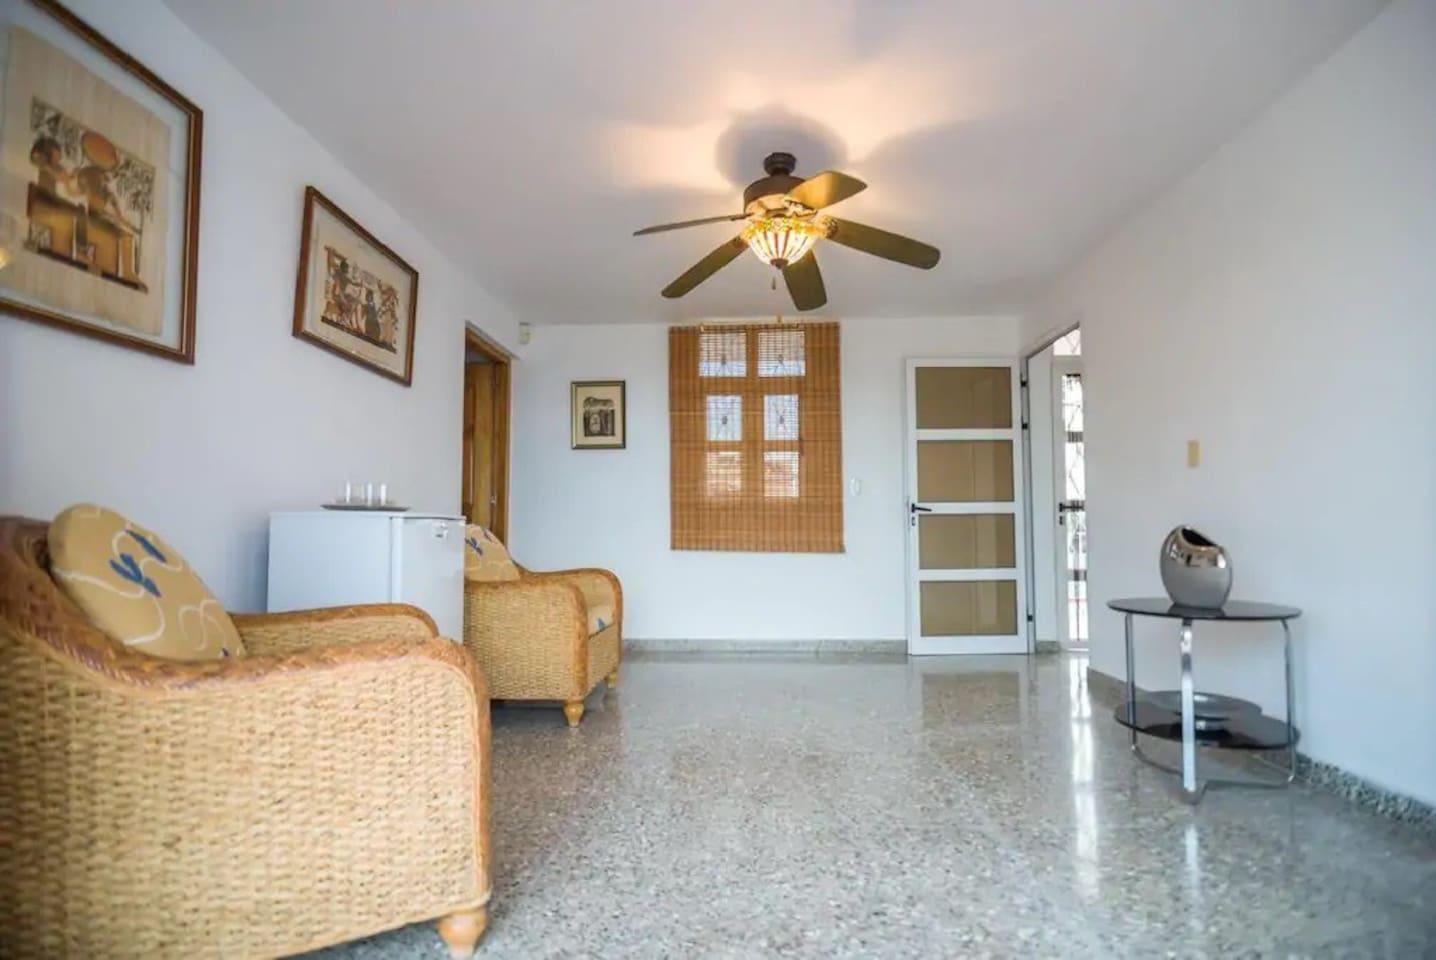 Apartment Villa Don Teto Suite   8 Rooms  Great Havana View photo 26030636